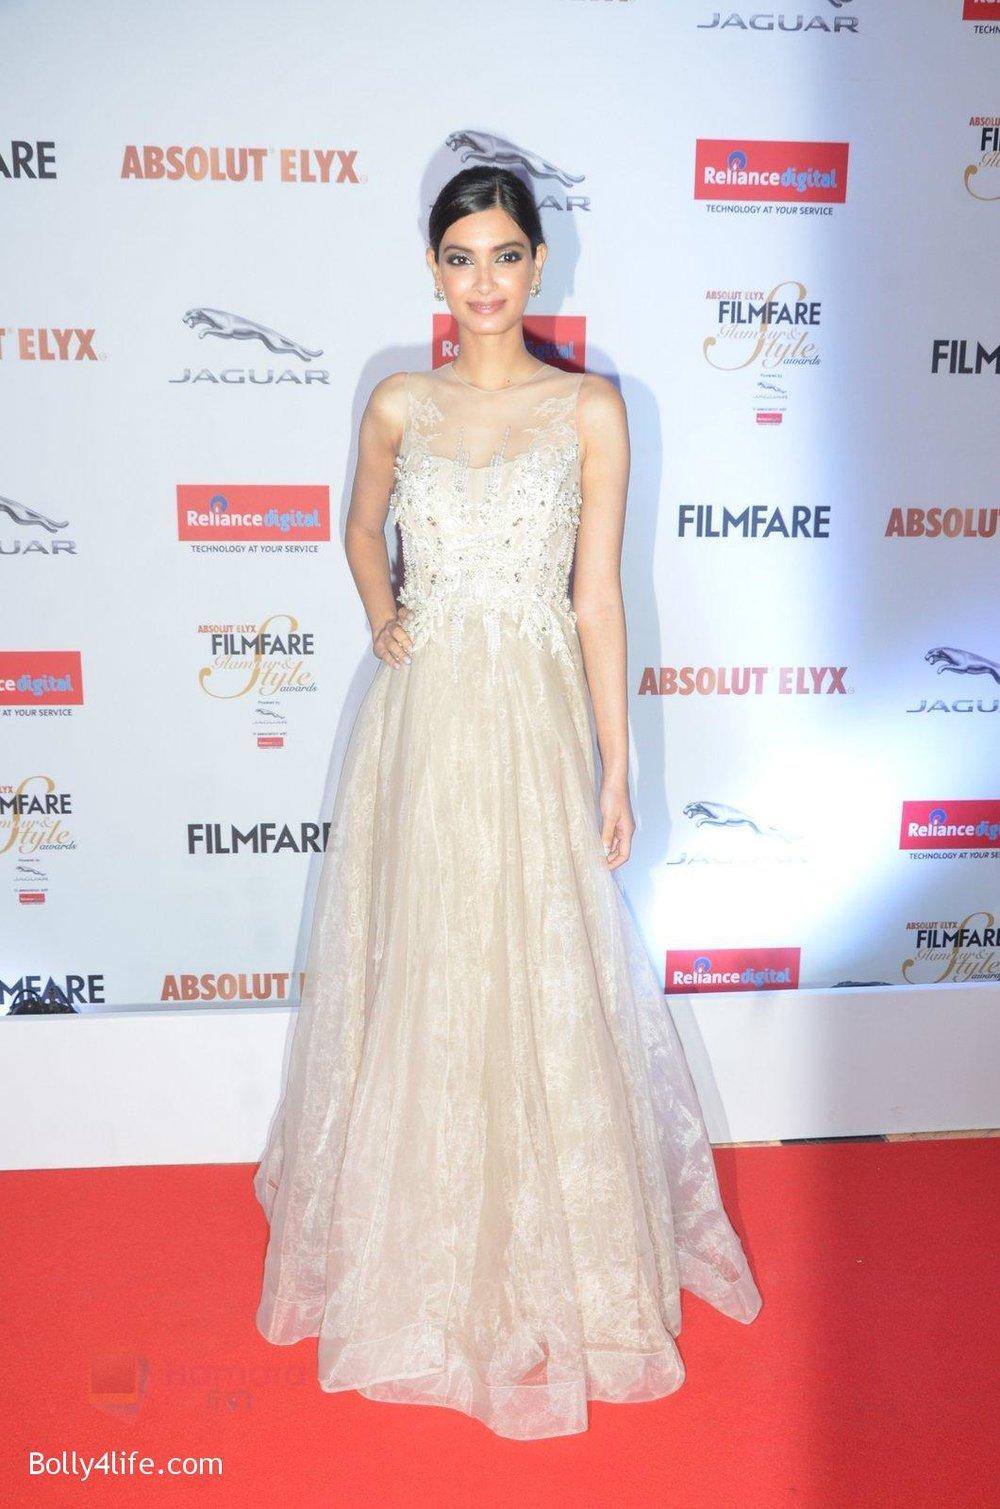 Diana-Penty-at-Filmfare-Glamour-Style-Awards-2016-in-Mumbai-on-15th-Oct-2016-1799.jpg